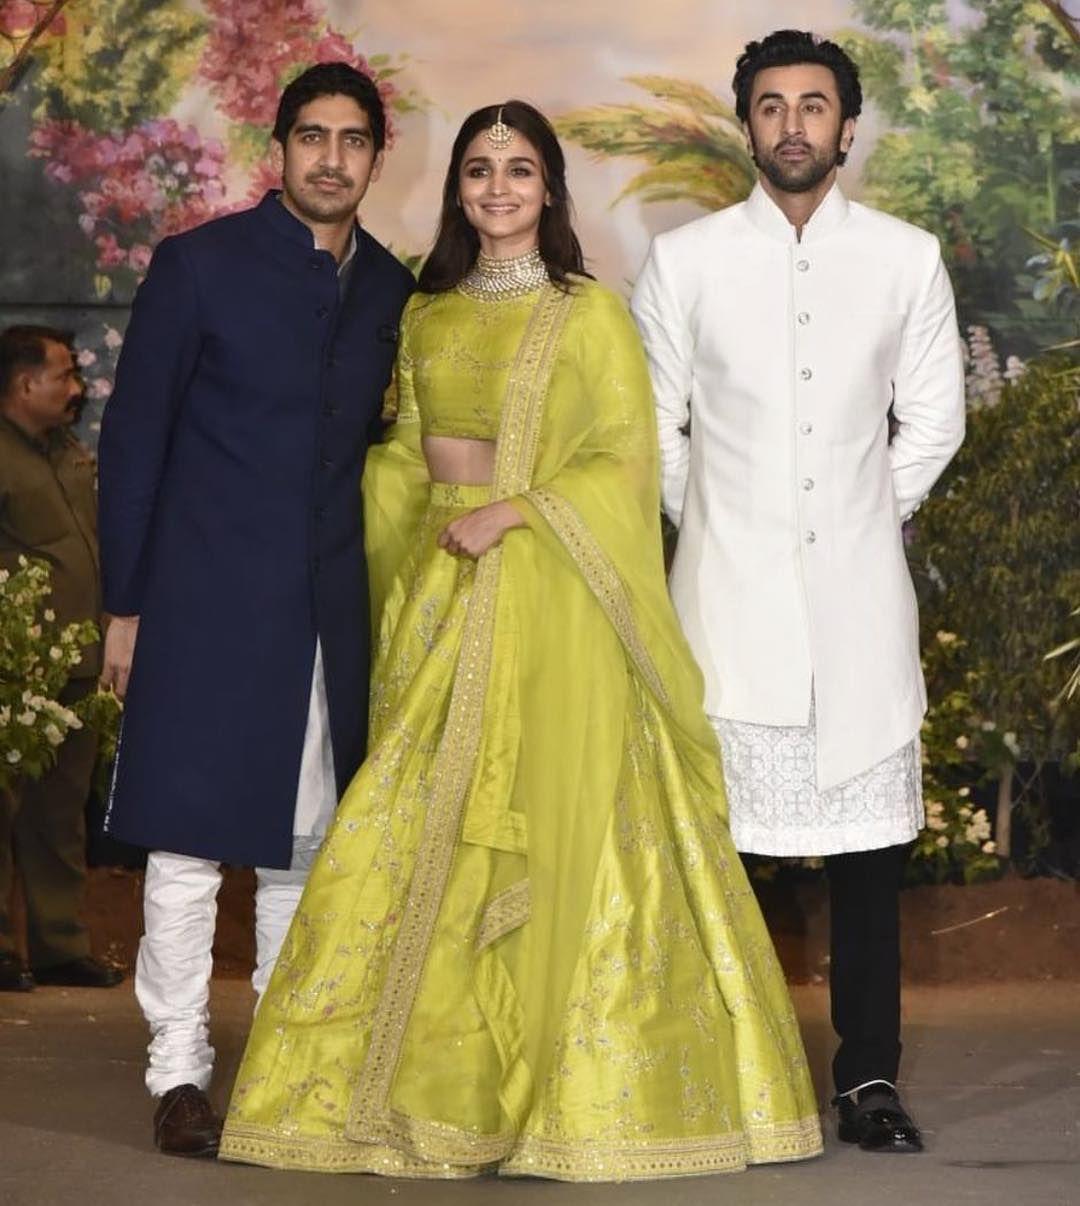 Sonam Kapoor Anand Ahuja Wedding Reception Kareena Kapoor Saif Shahid Kapoor Mira Shah Indian Wedding Outfits Indian Engagement Outfit Bollywood Dress